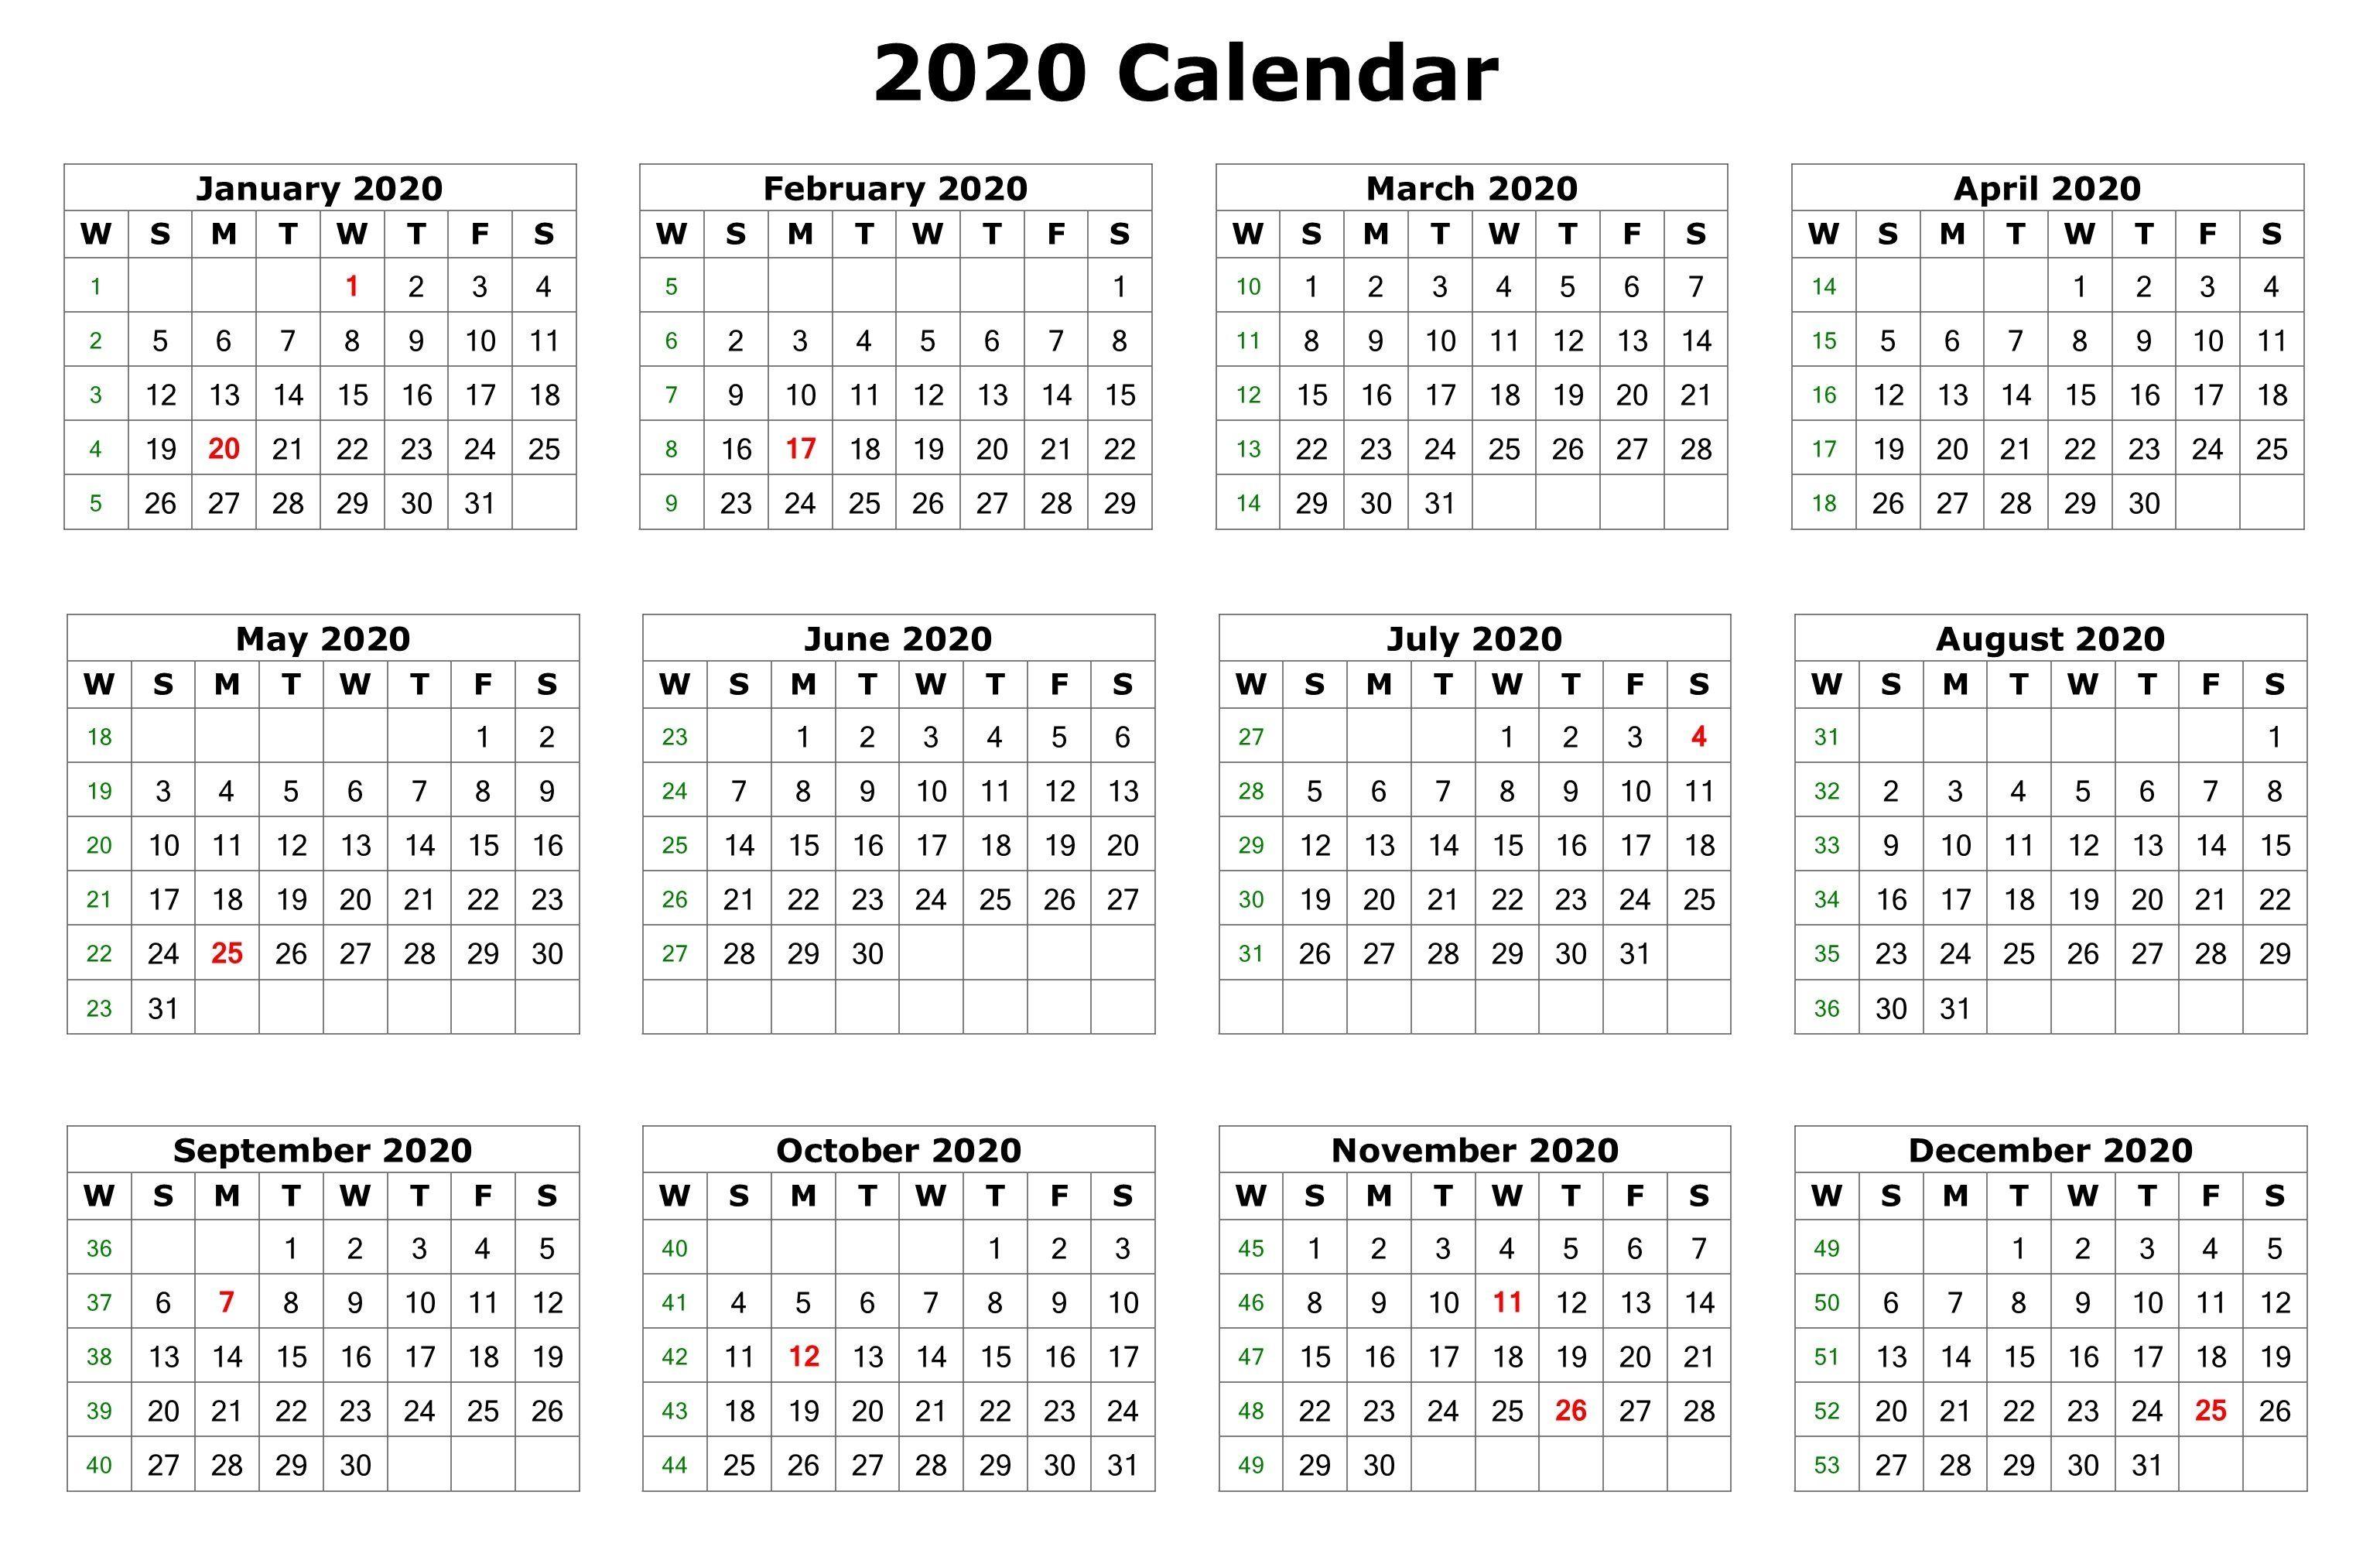 2020 One Page Calendar Printable Calendar 2020 12 Month Calendar Printable Calendar Template Monthly Calendar Printable